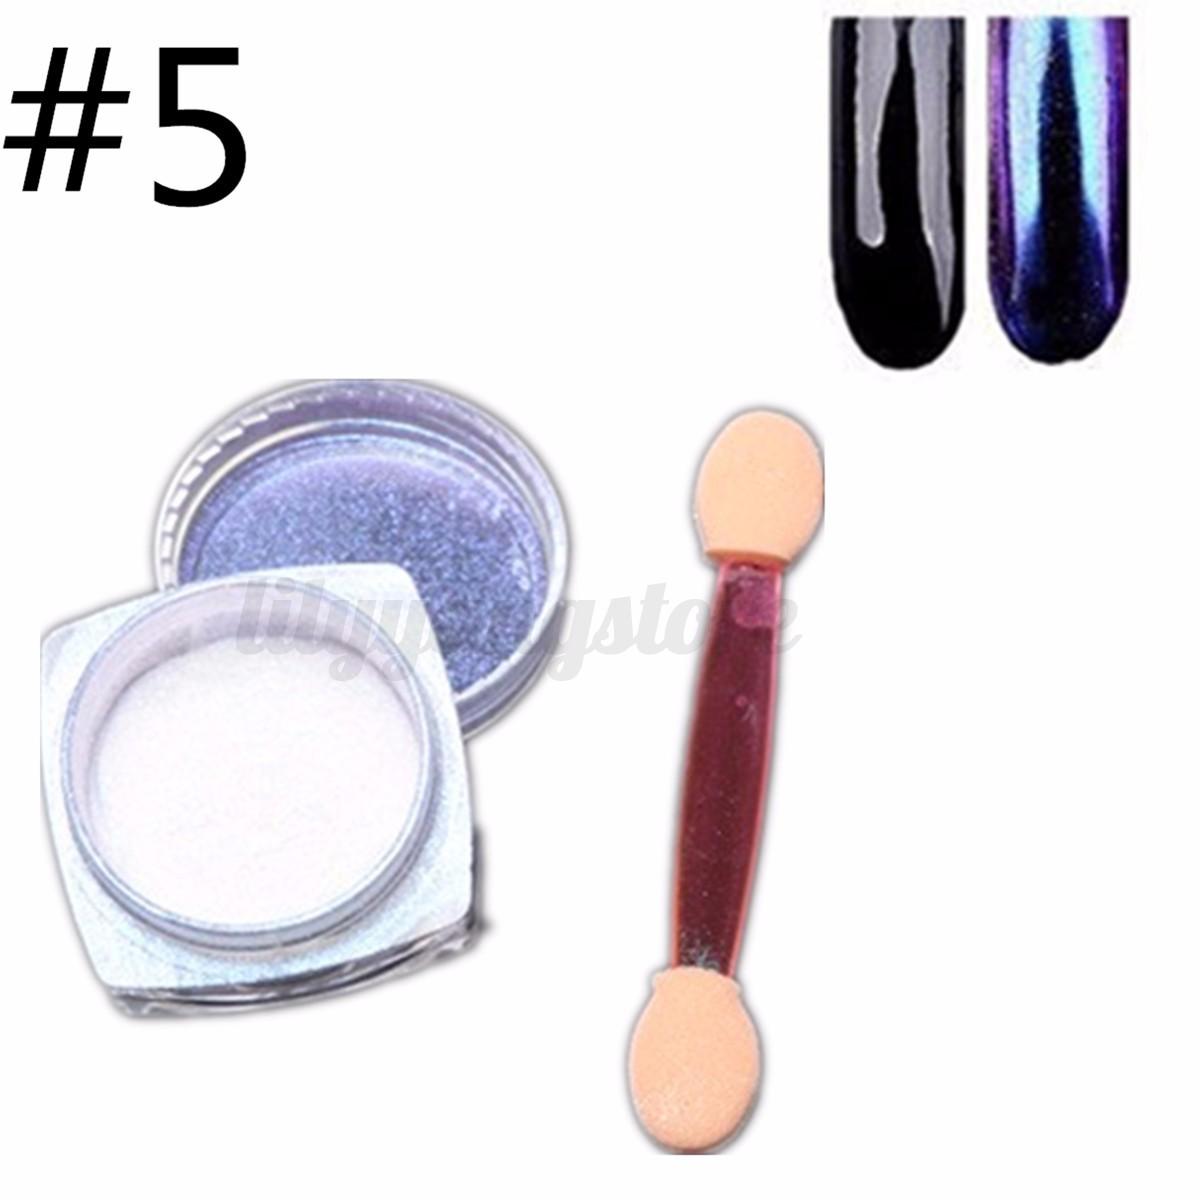 12 Farbe Nagel Pigment Puder Pulver Mirror Powder Nails Chrome Glitter 2g Kit | EBay